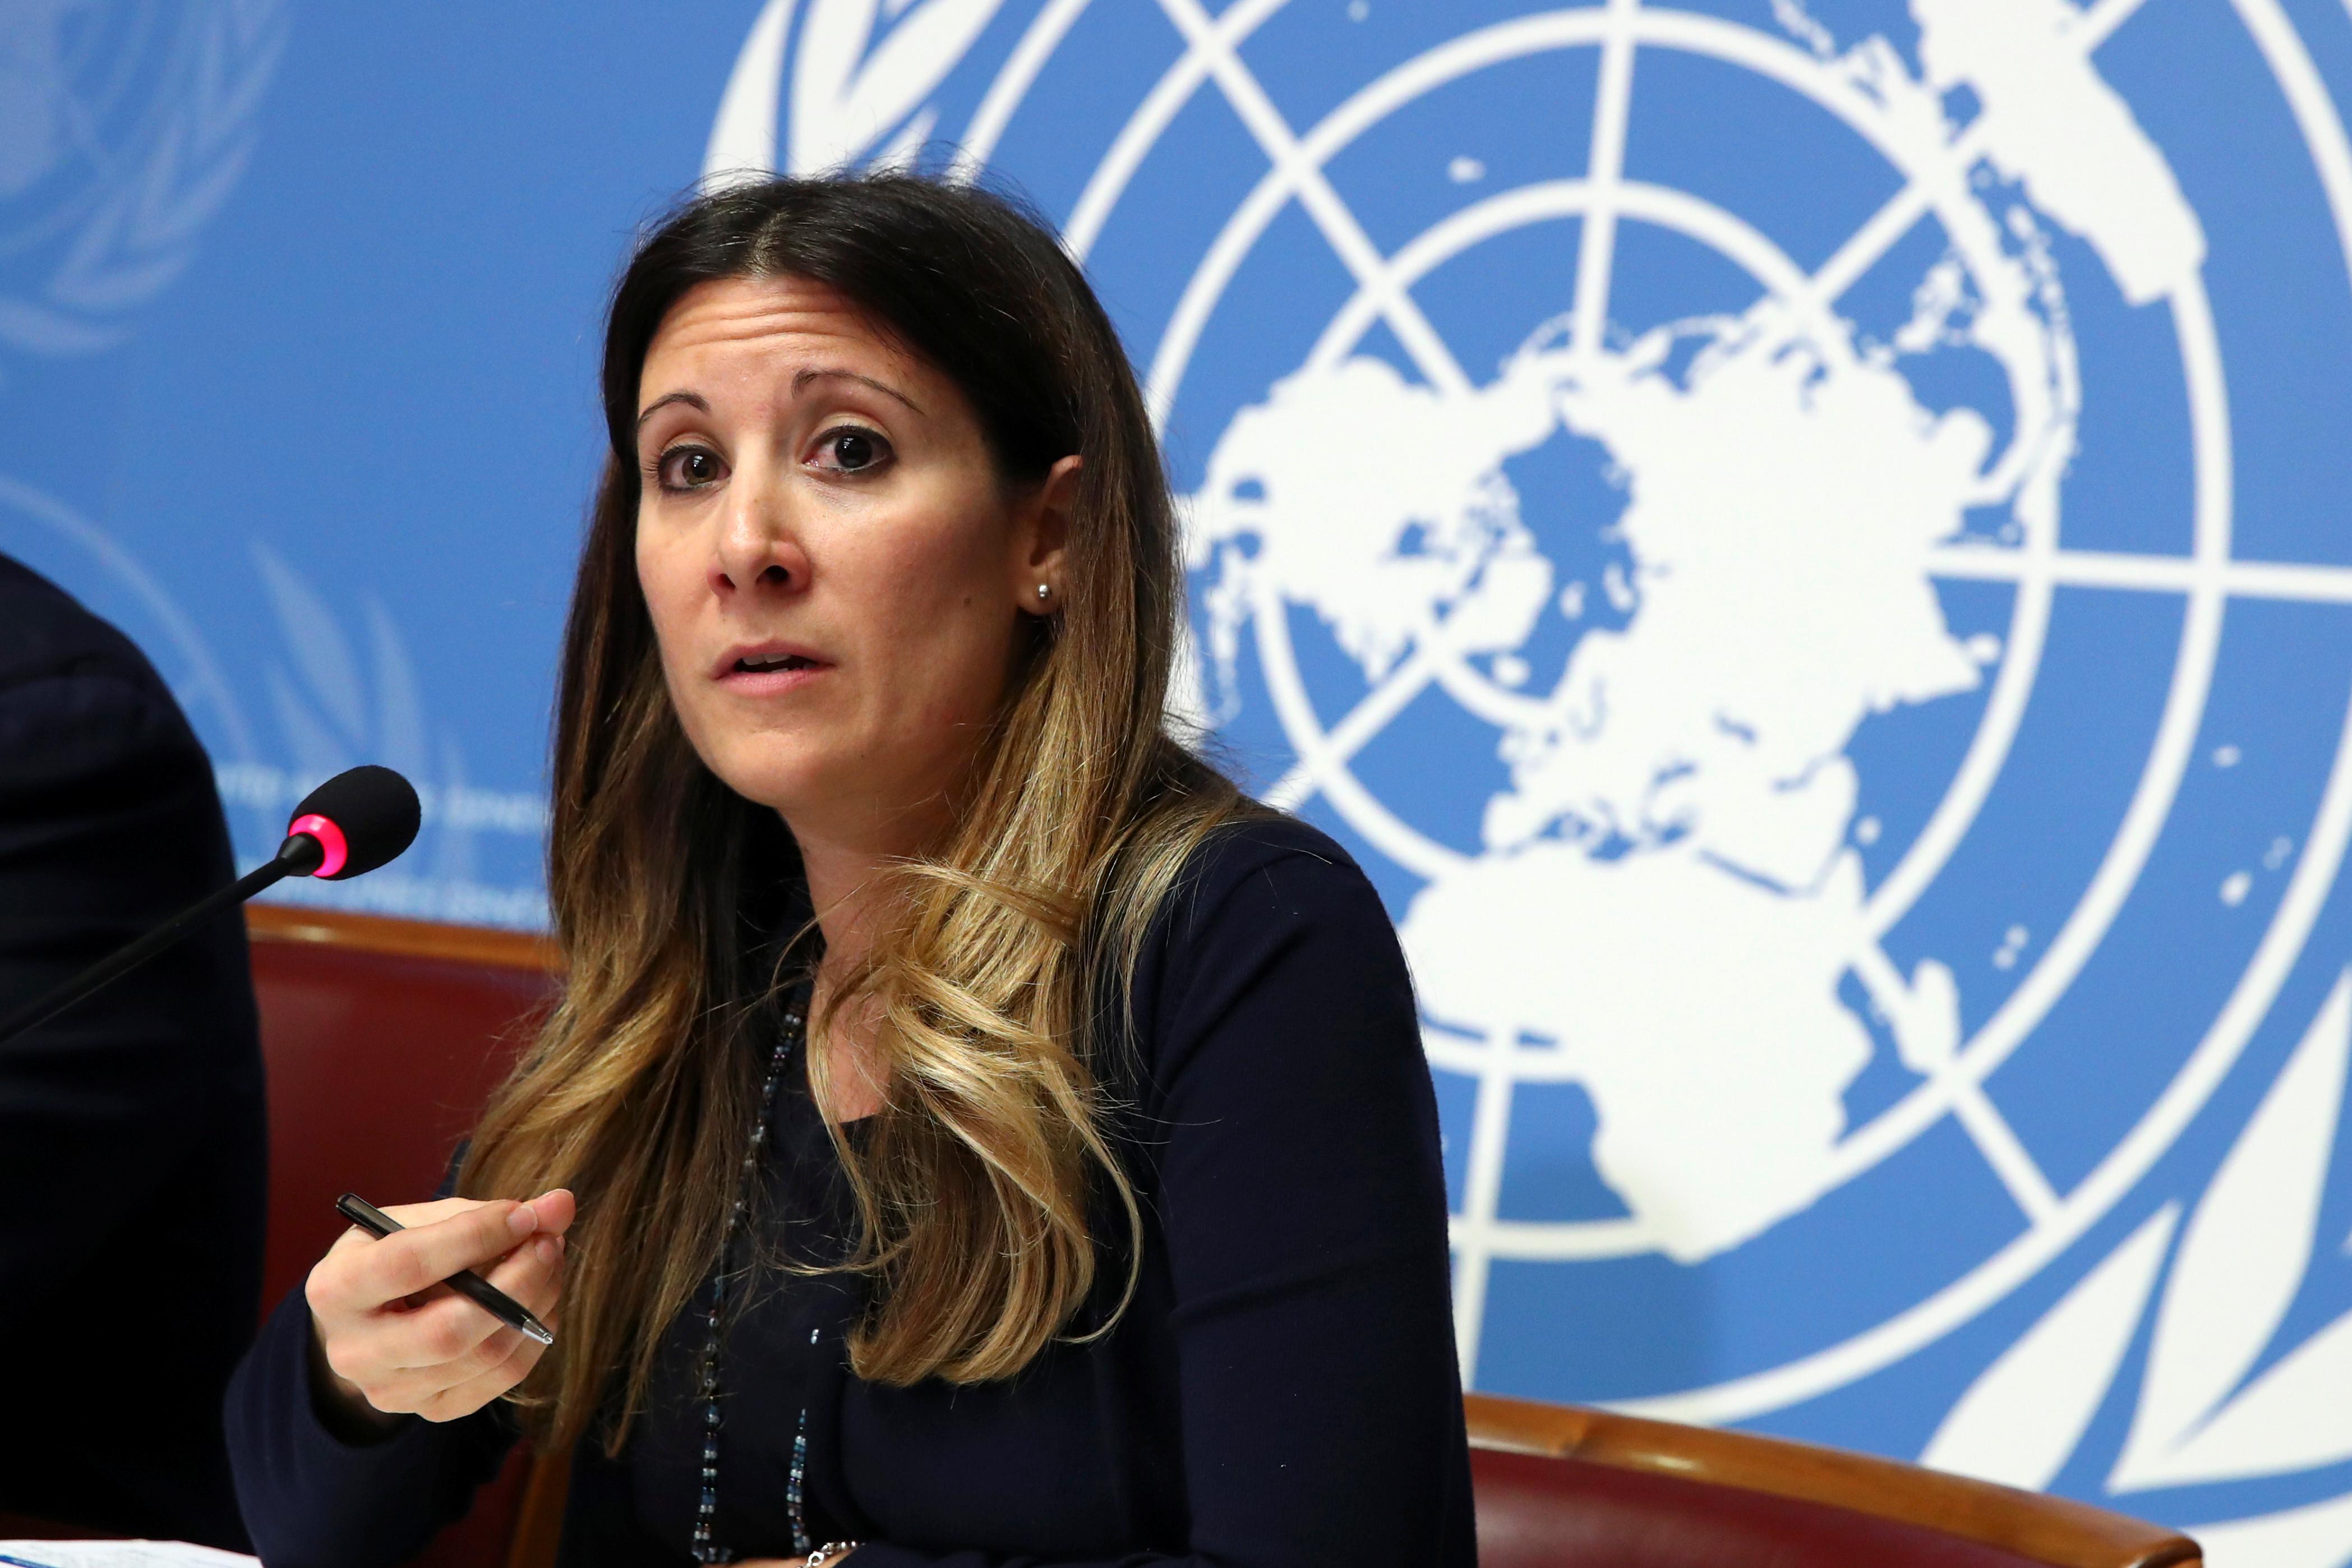 WHO:欧洲抗疫要认真加把劲 但没必要实施全国封锁